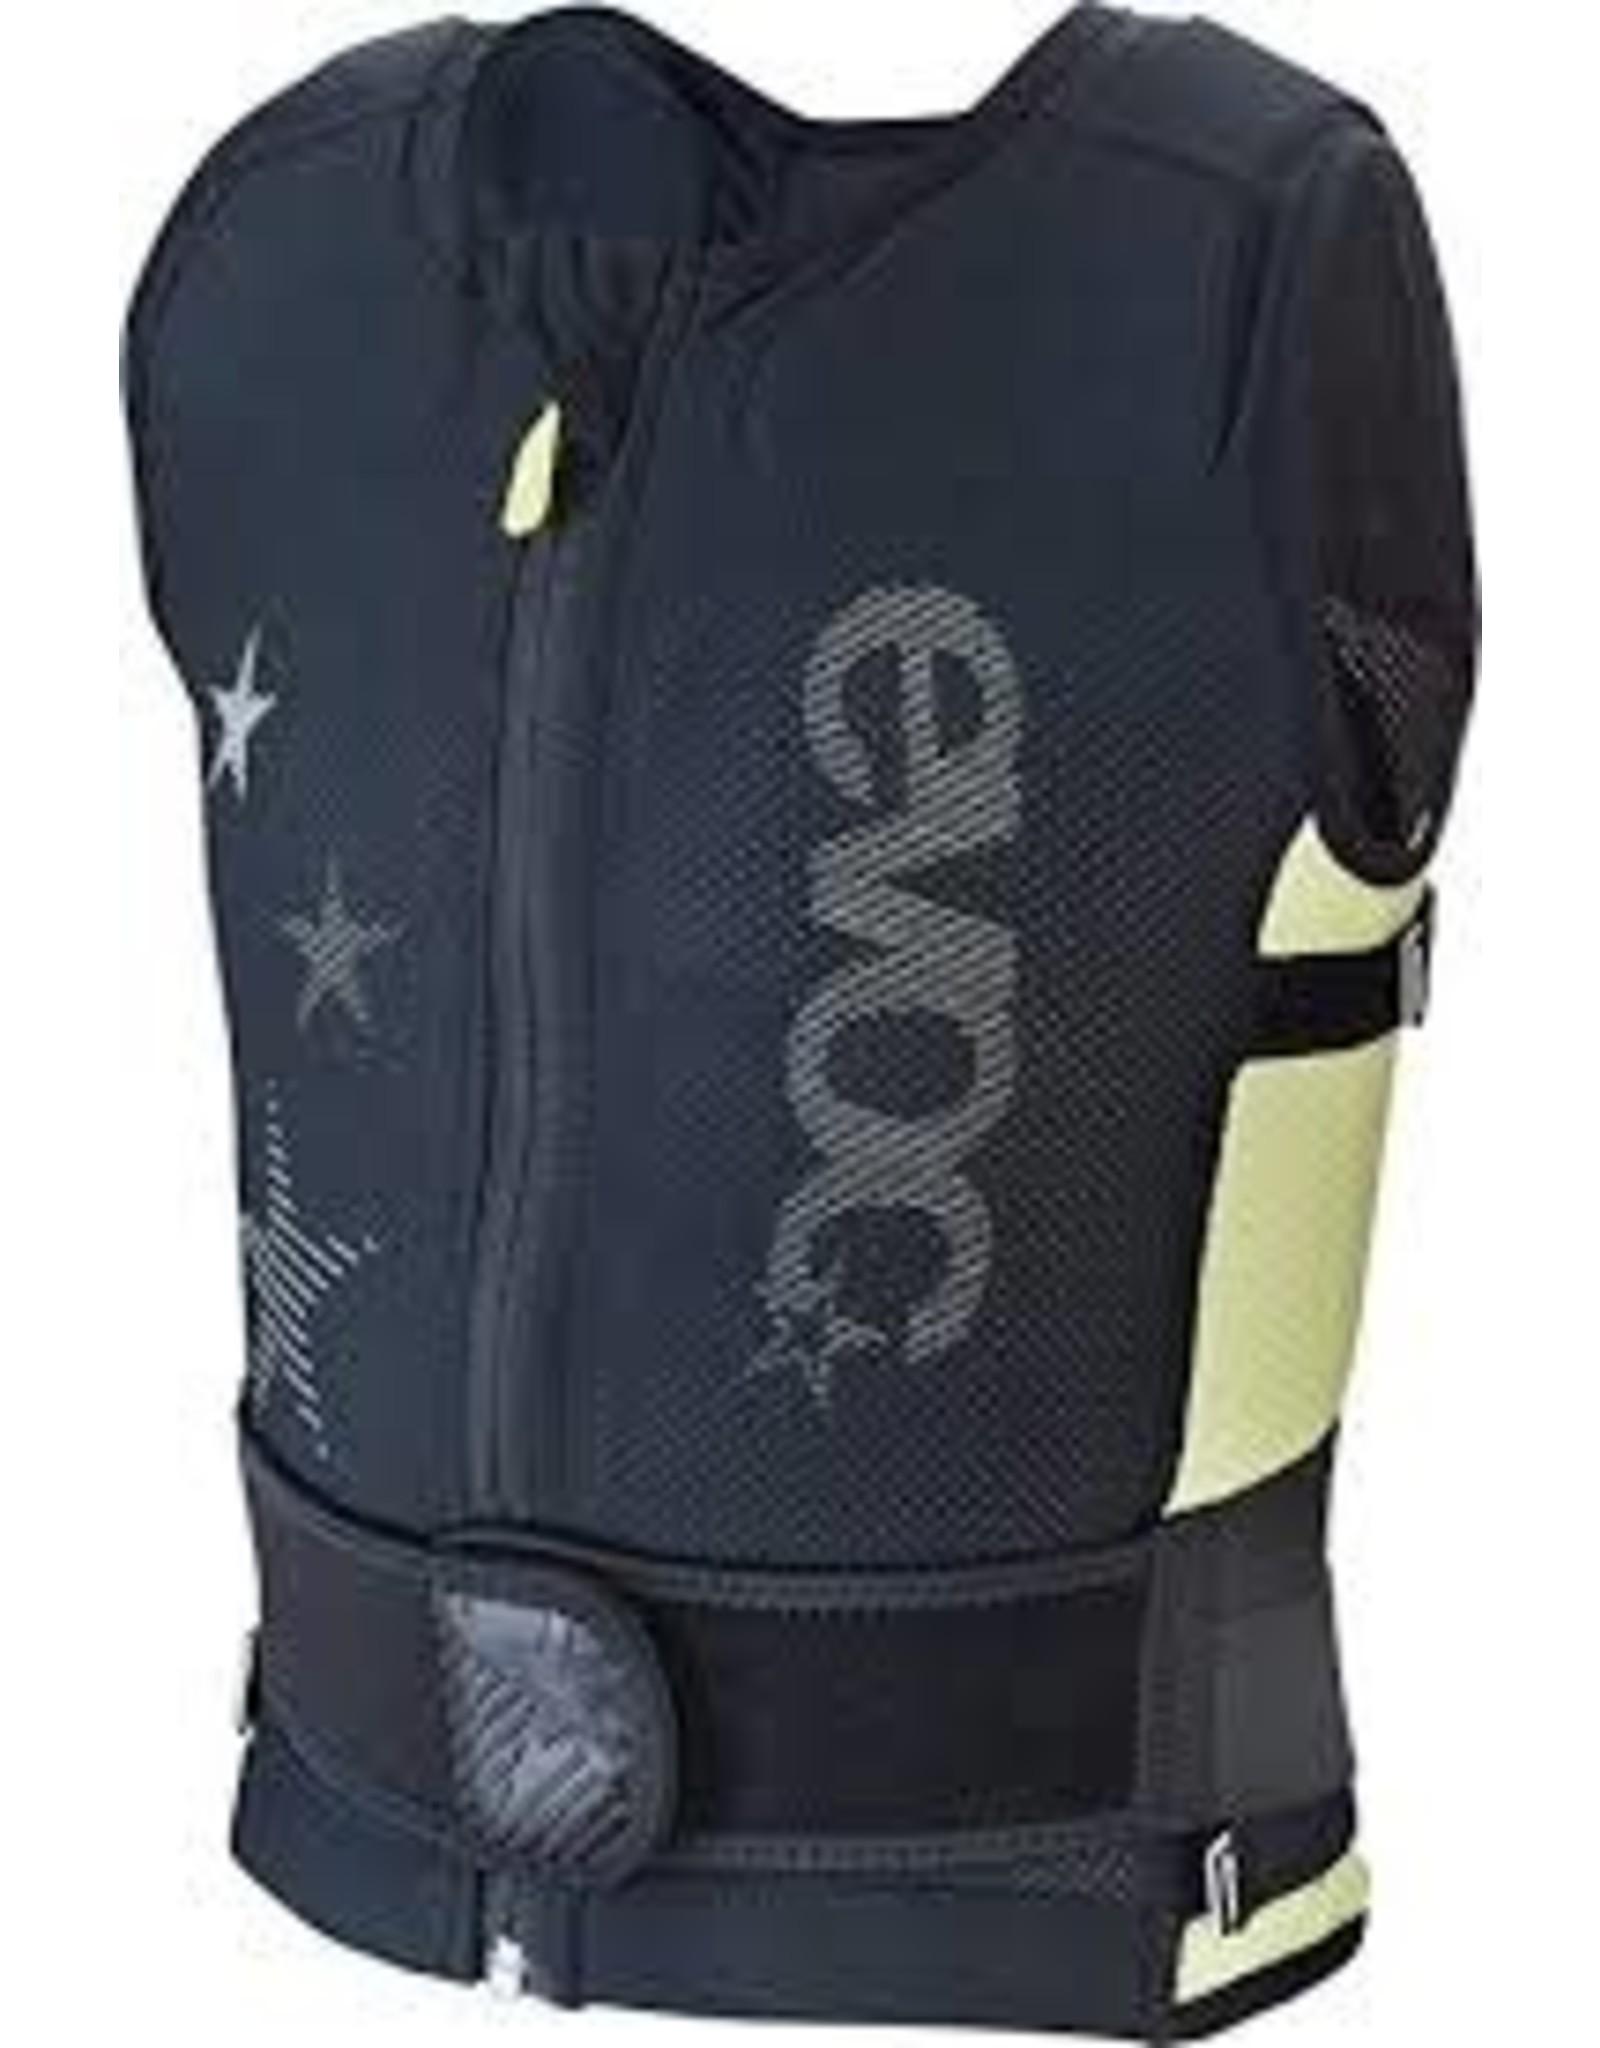 EVOC EVOC - Protector Vest Kids, Black/Lime, L